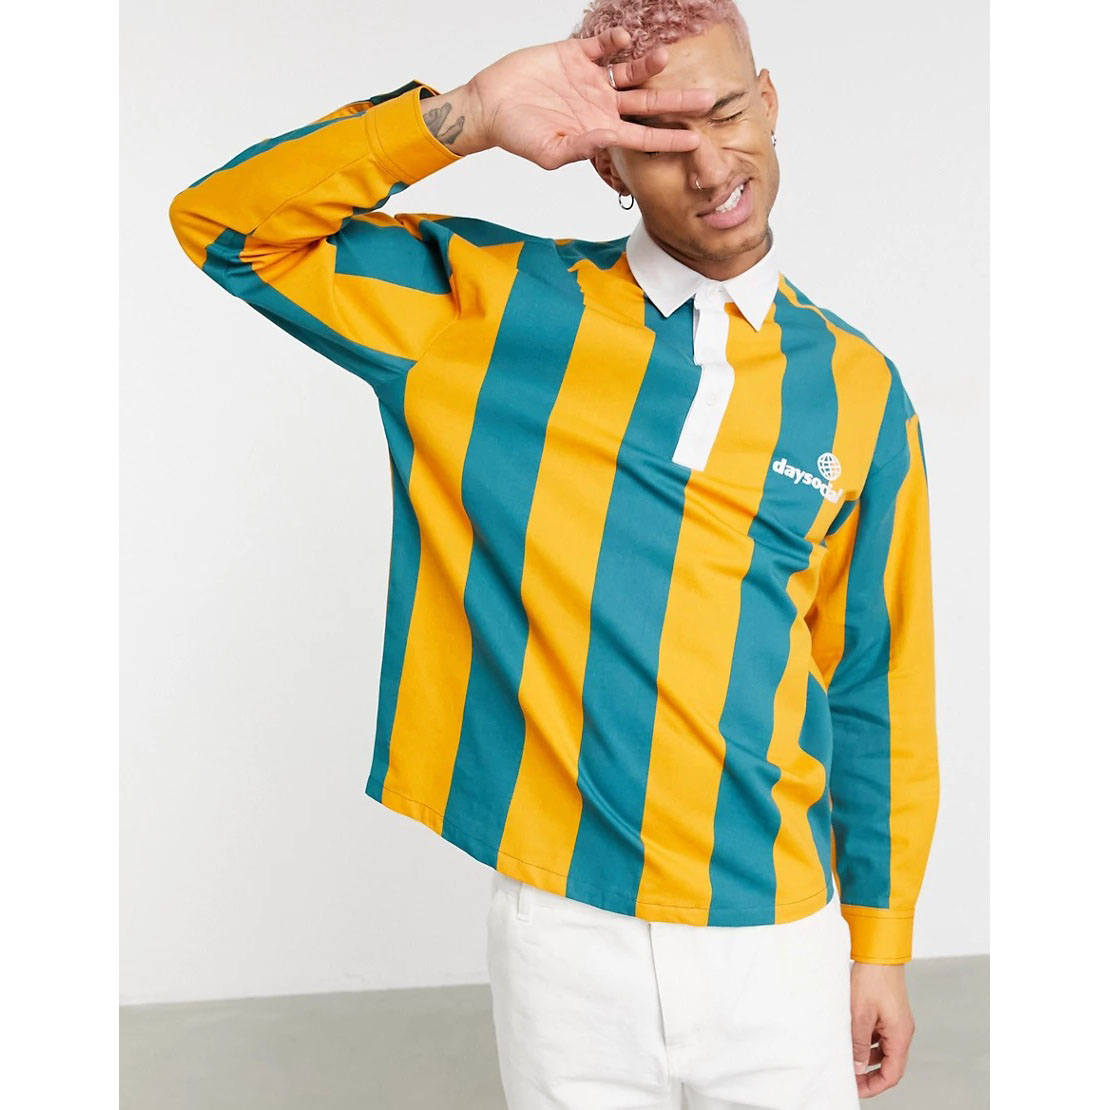 ASOS Daysocial Rugby Overhead Shirt